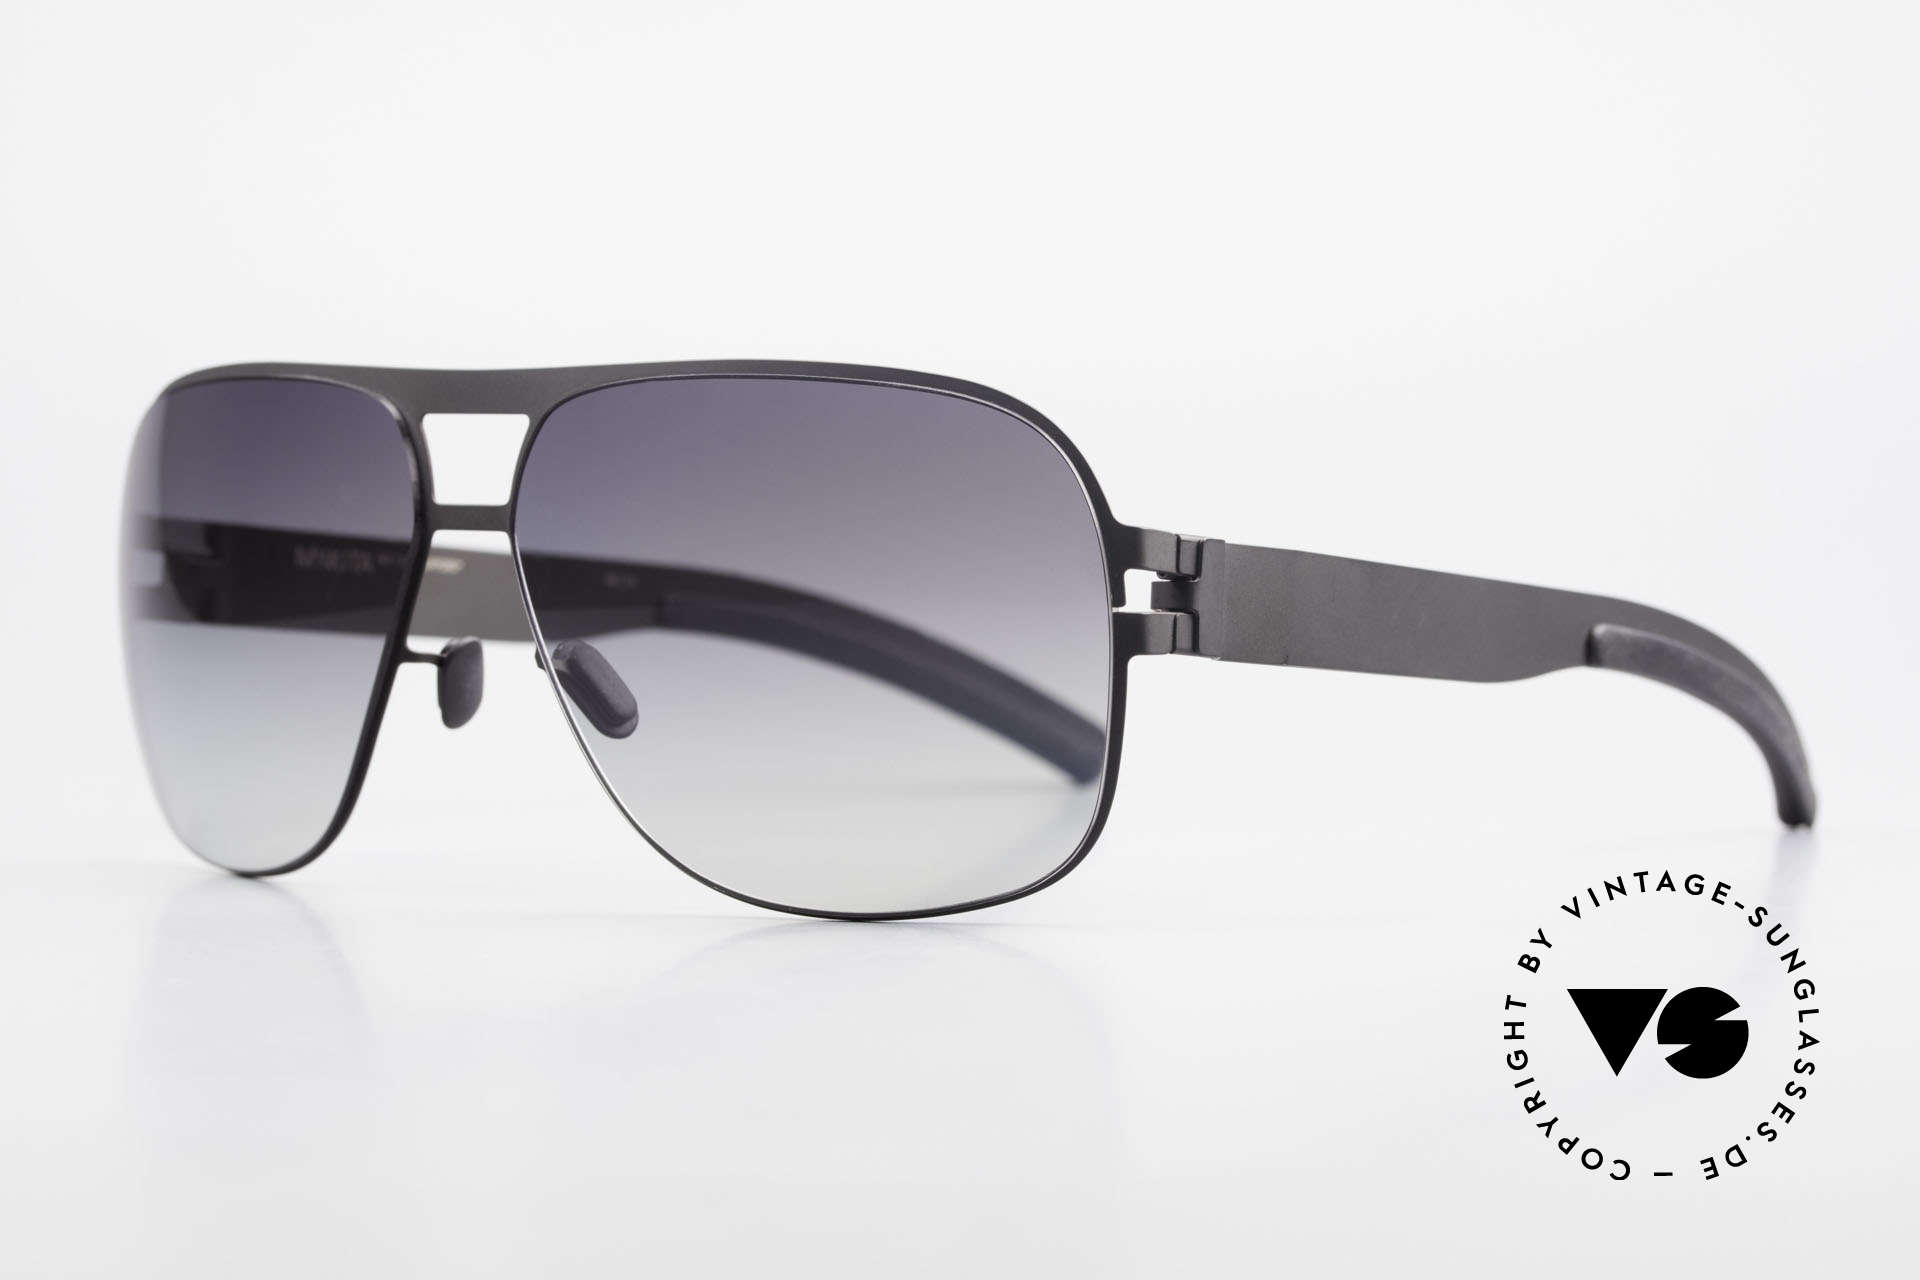 Mykita Clifford 2000's Vintage Designer Shades, Mod. No.1 Sun Clifford Black, black-gradient, in 62/12, Made for Men